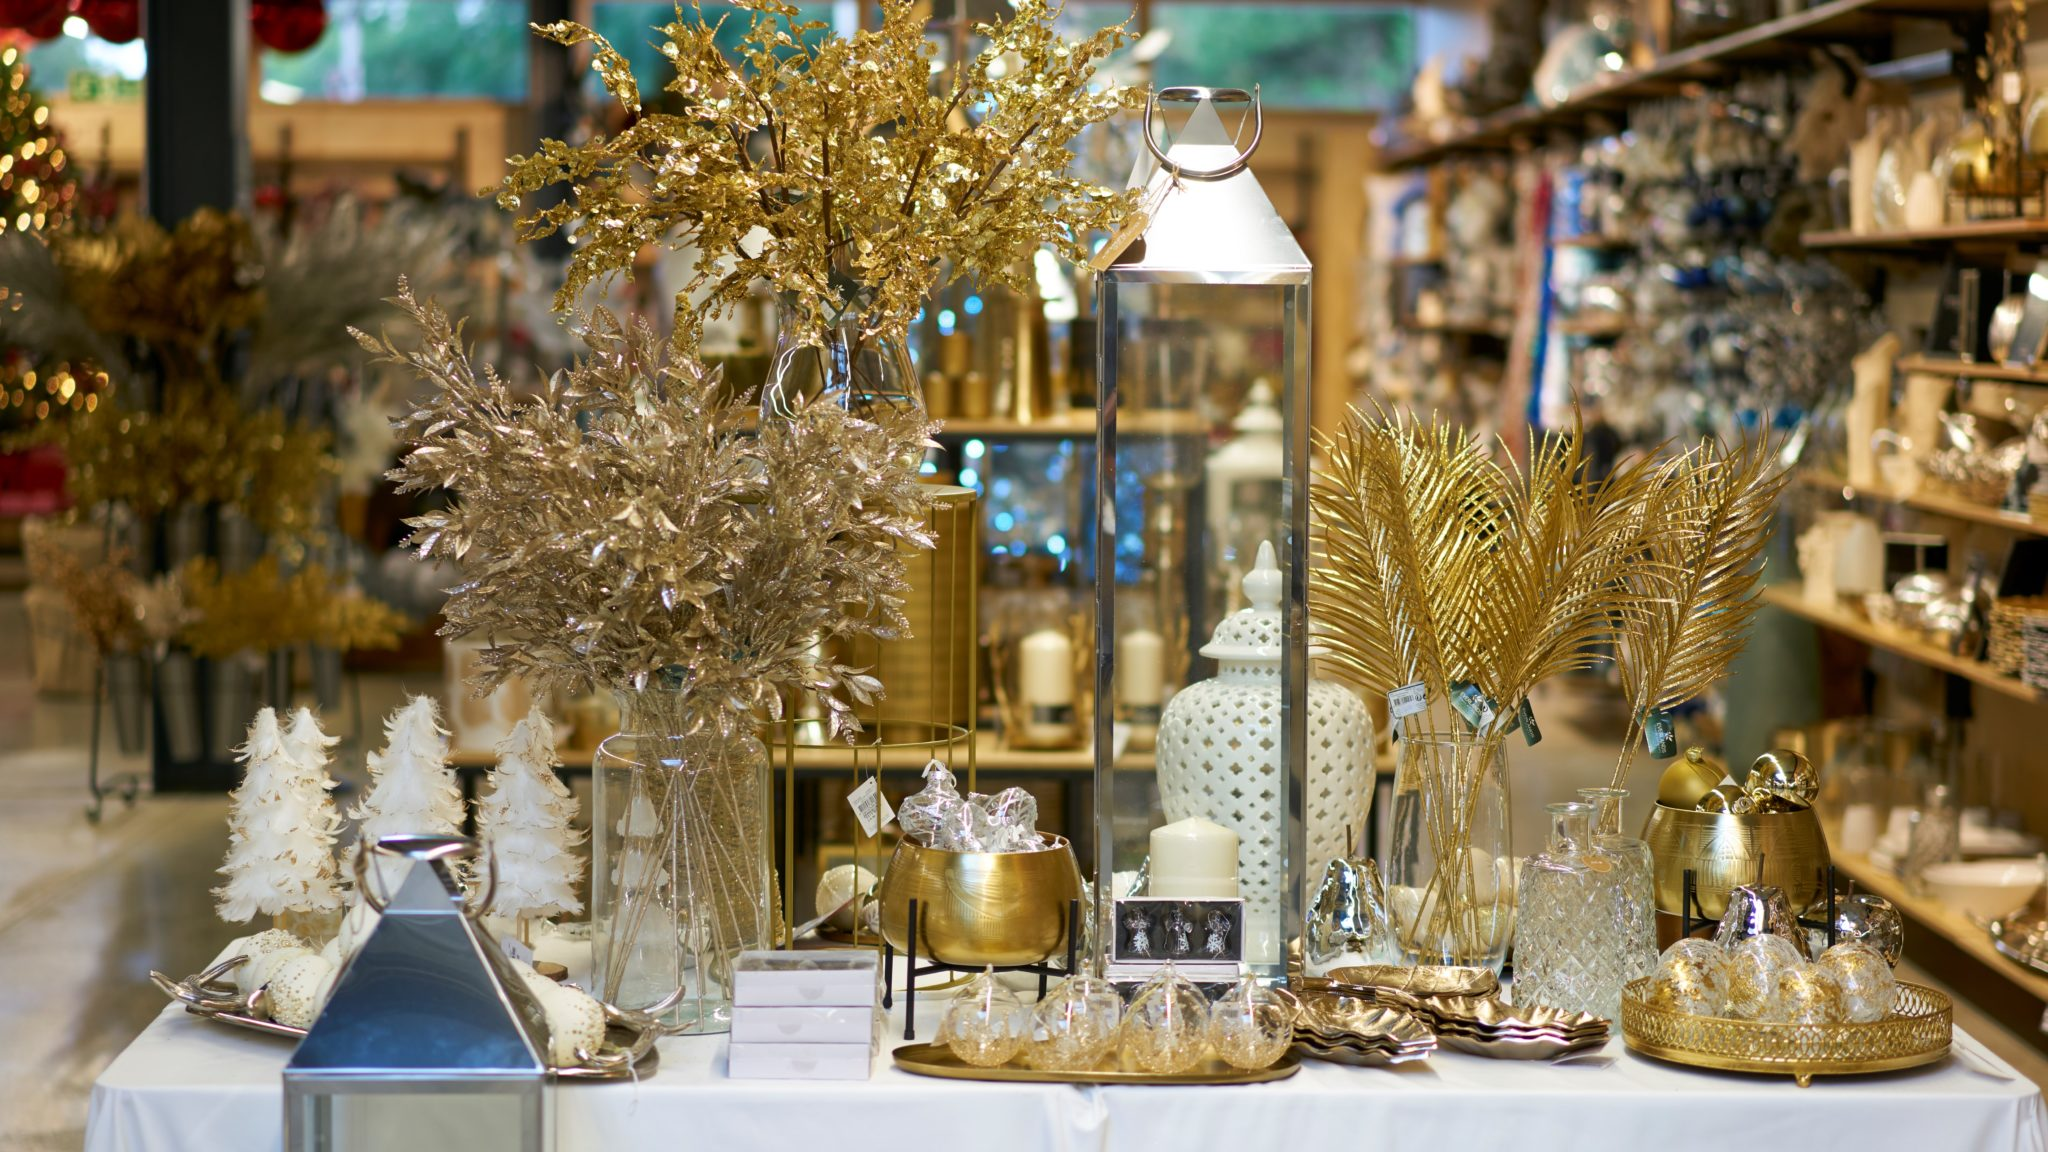 Bright Luxury Decorations